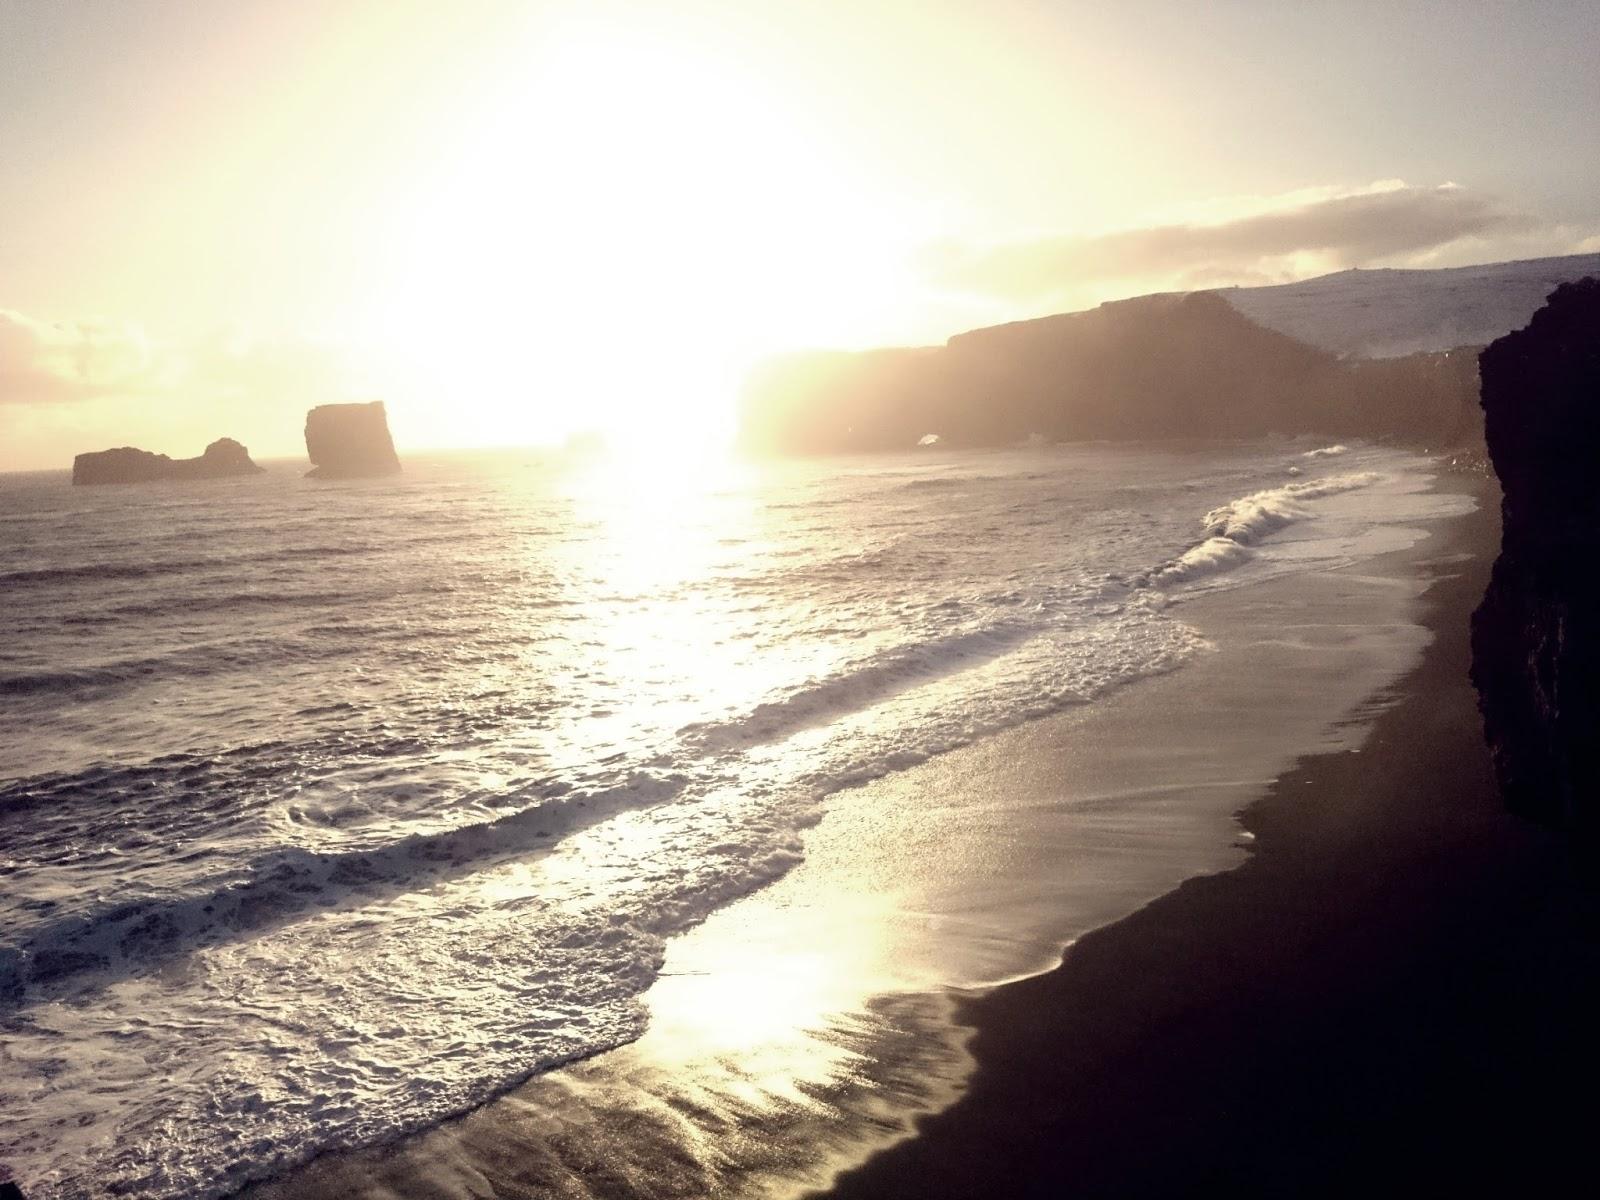 zachód słońca, plaża, czarna plaża, Dyrholaey, Islandia, panidorcia, blog o Islandii